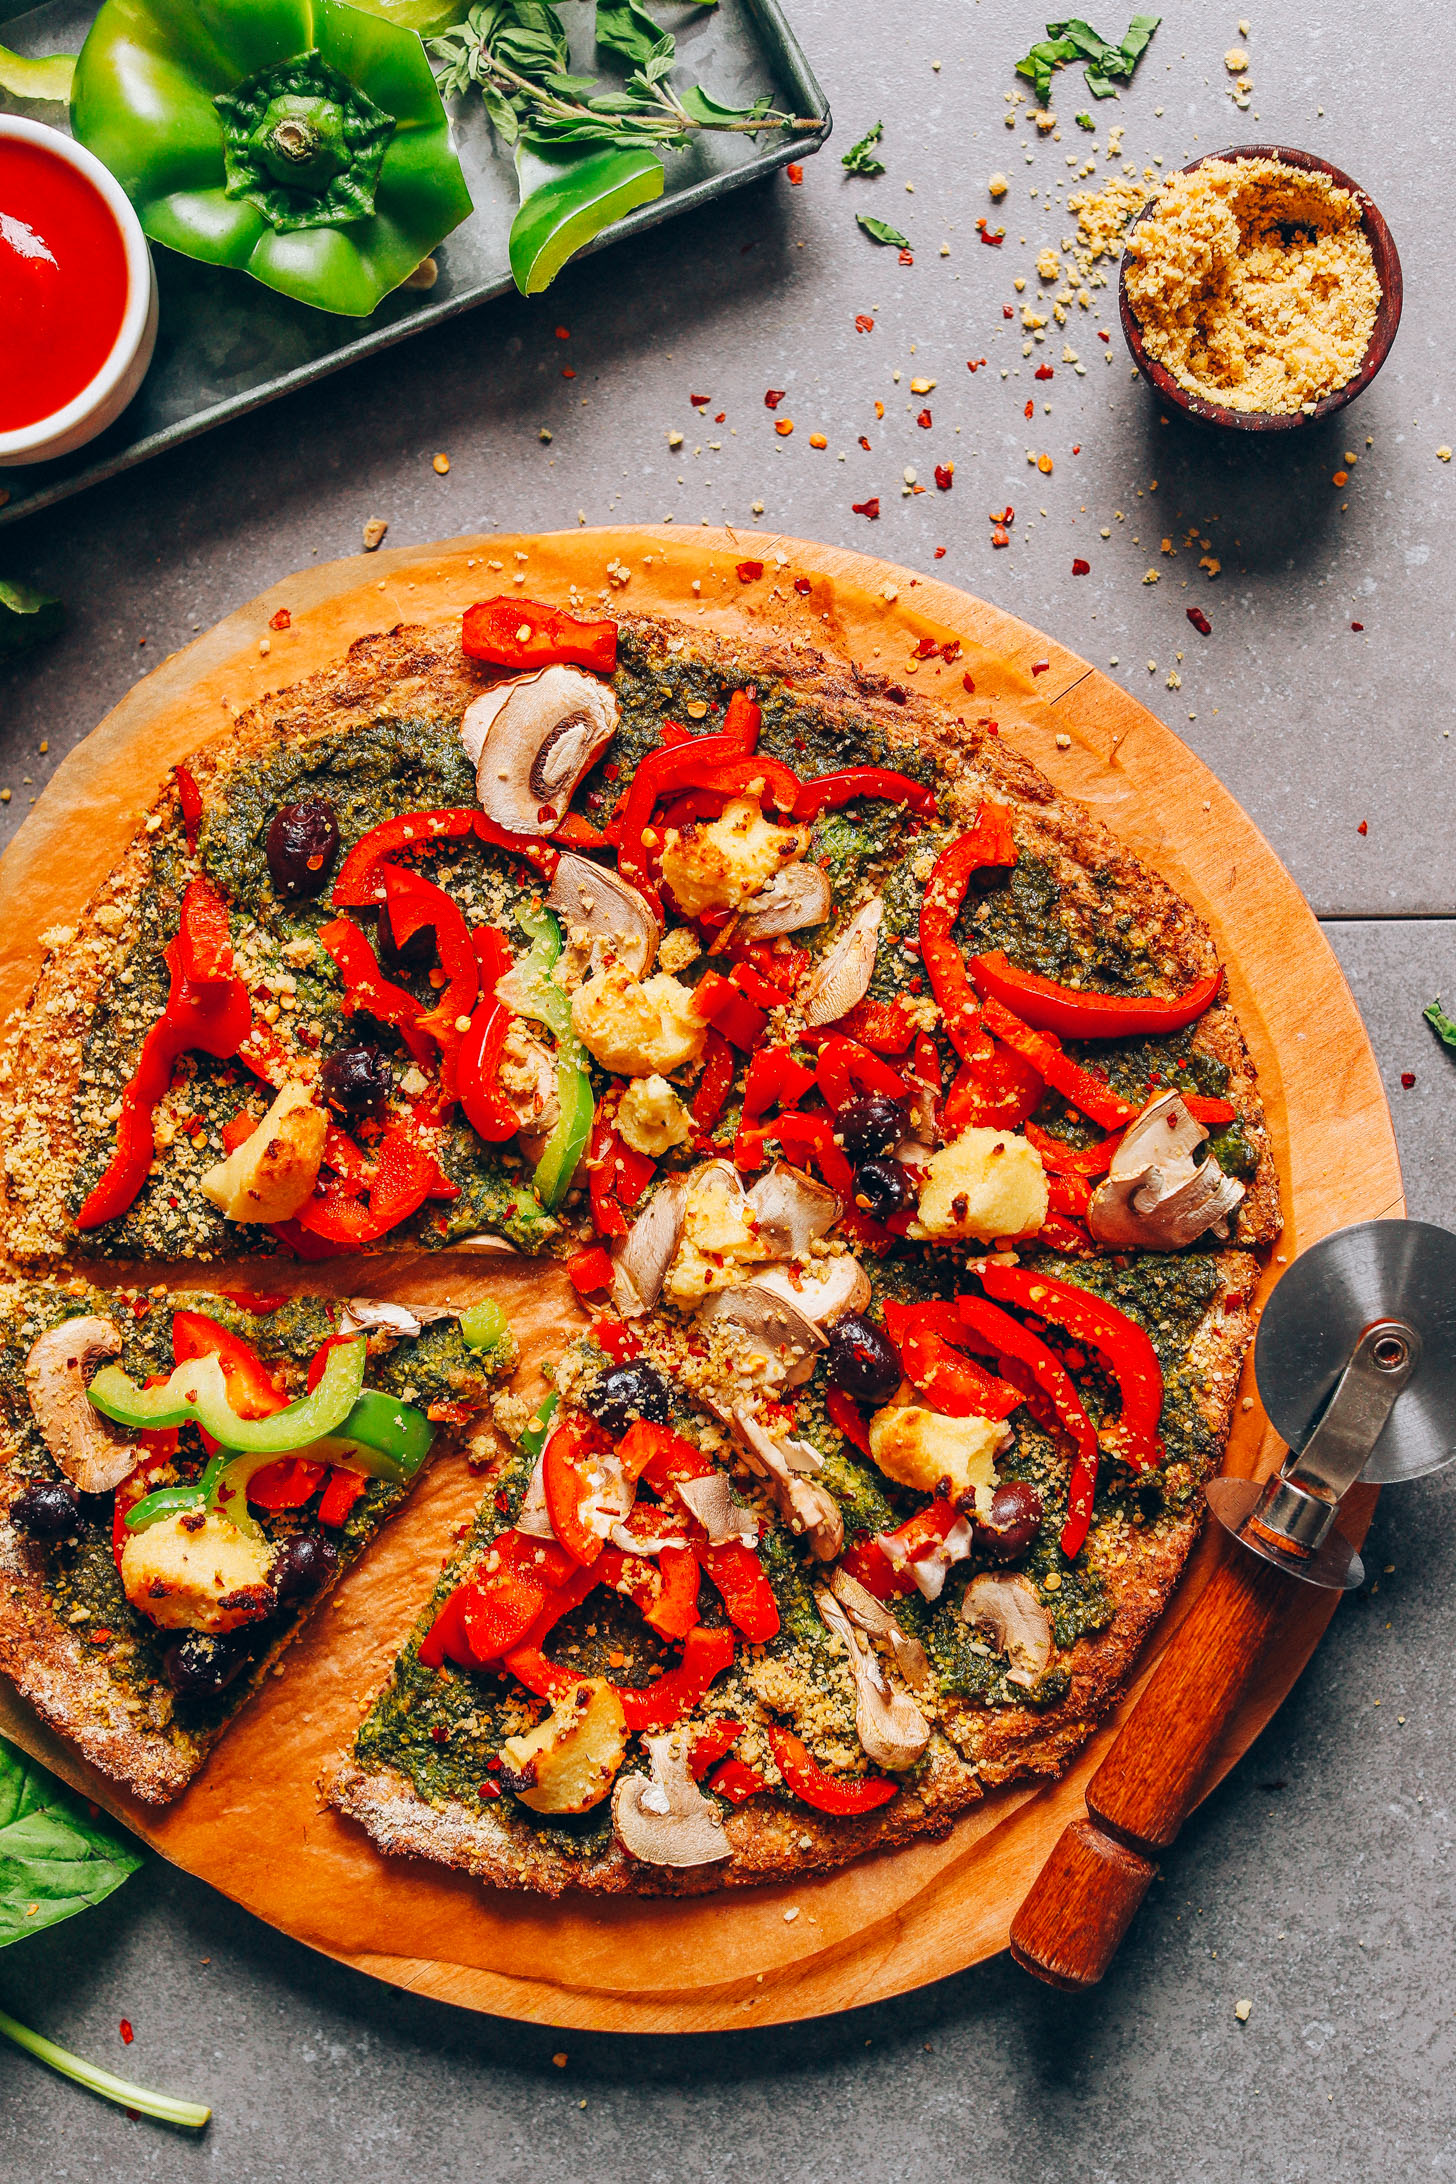 DELICIOUS-Vegan-Gluten-Free-Cauliflower-Pizza-Crust-10-ingredients-simple-methods-crispy-crust-tender-center-vegan-glutenfree-plantbased-pizza-cauliflower-minimalistbaker-recipe6.jpg